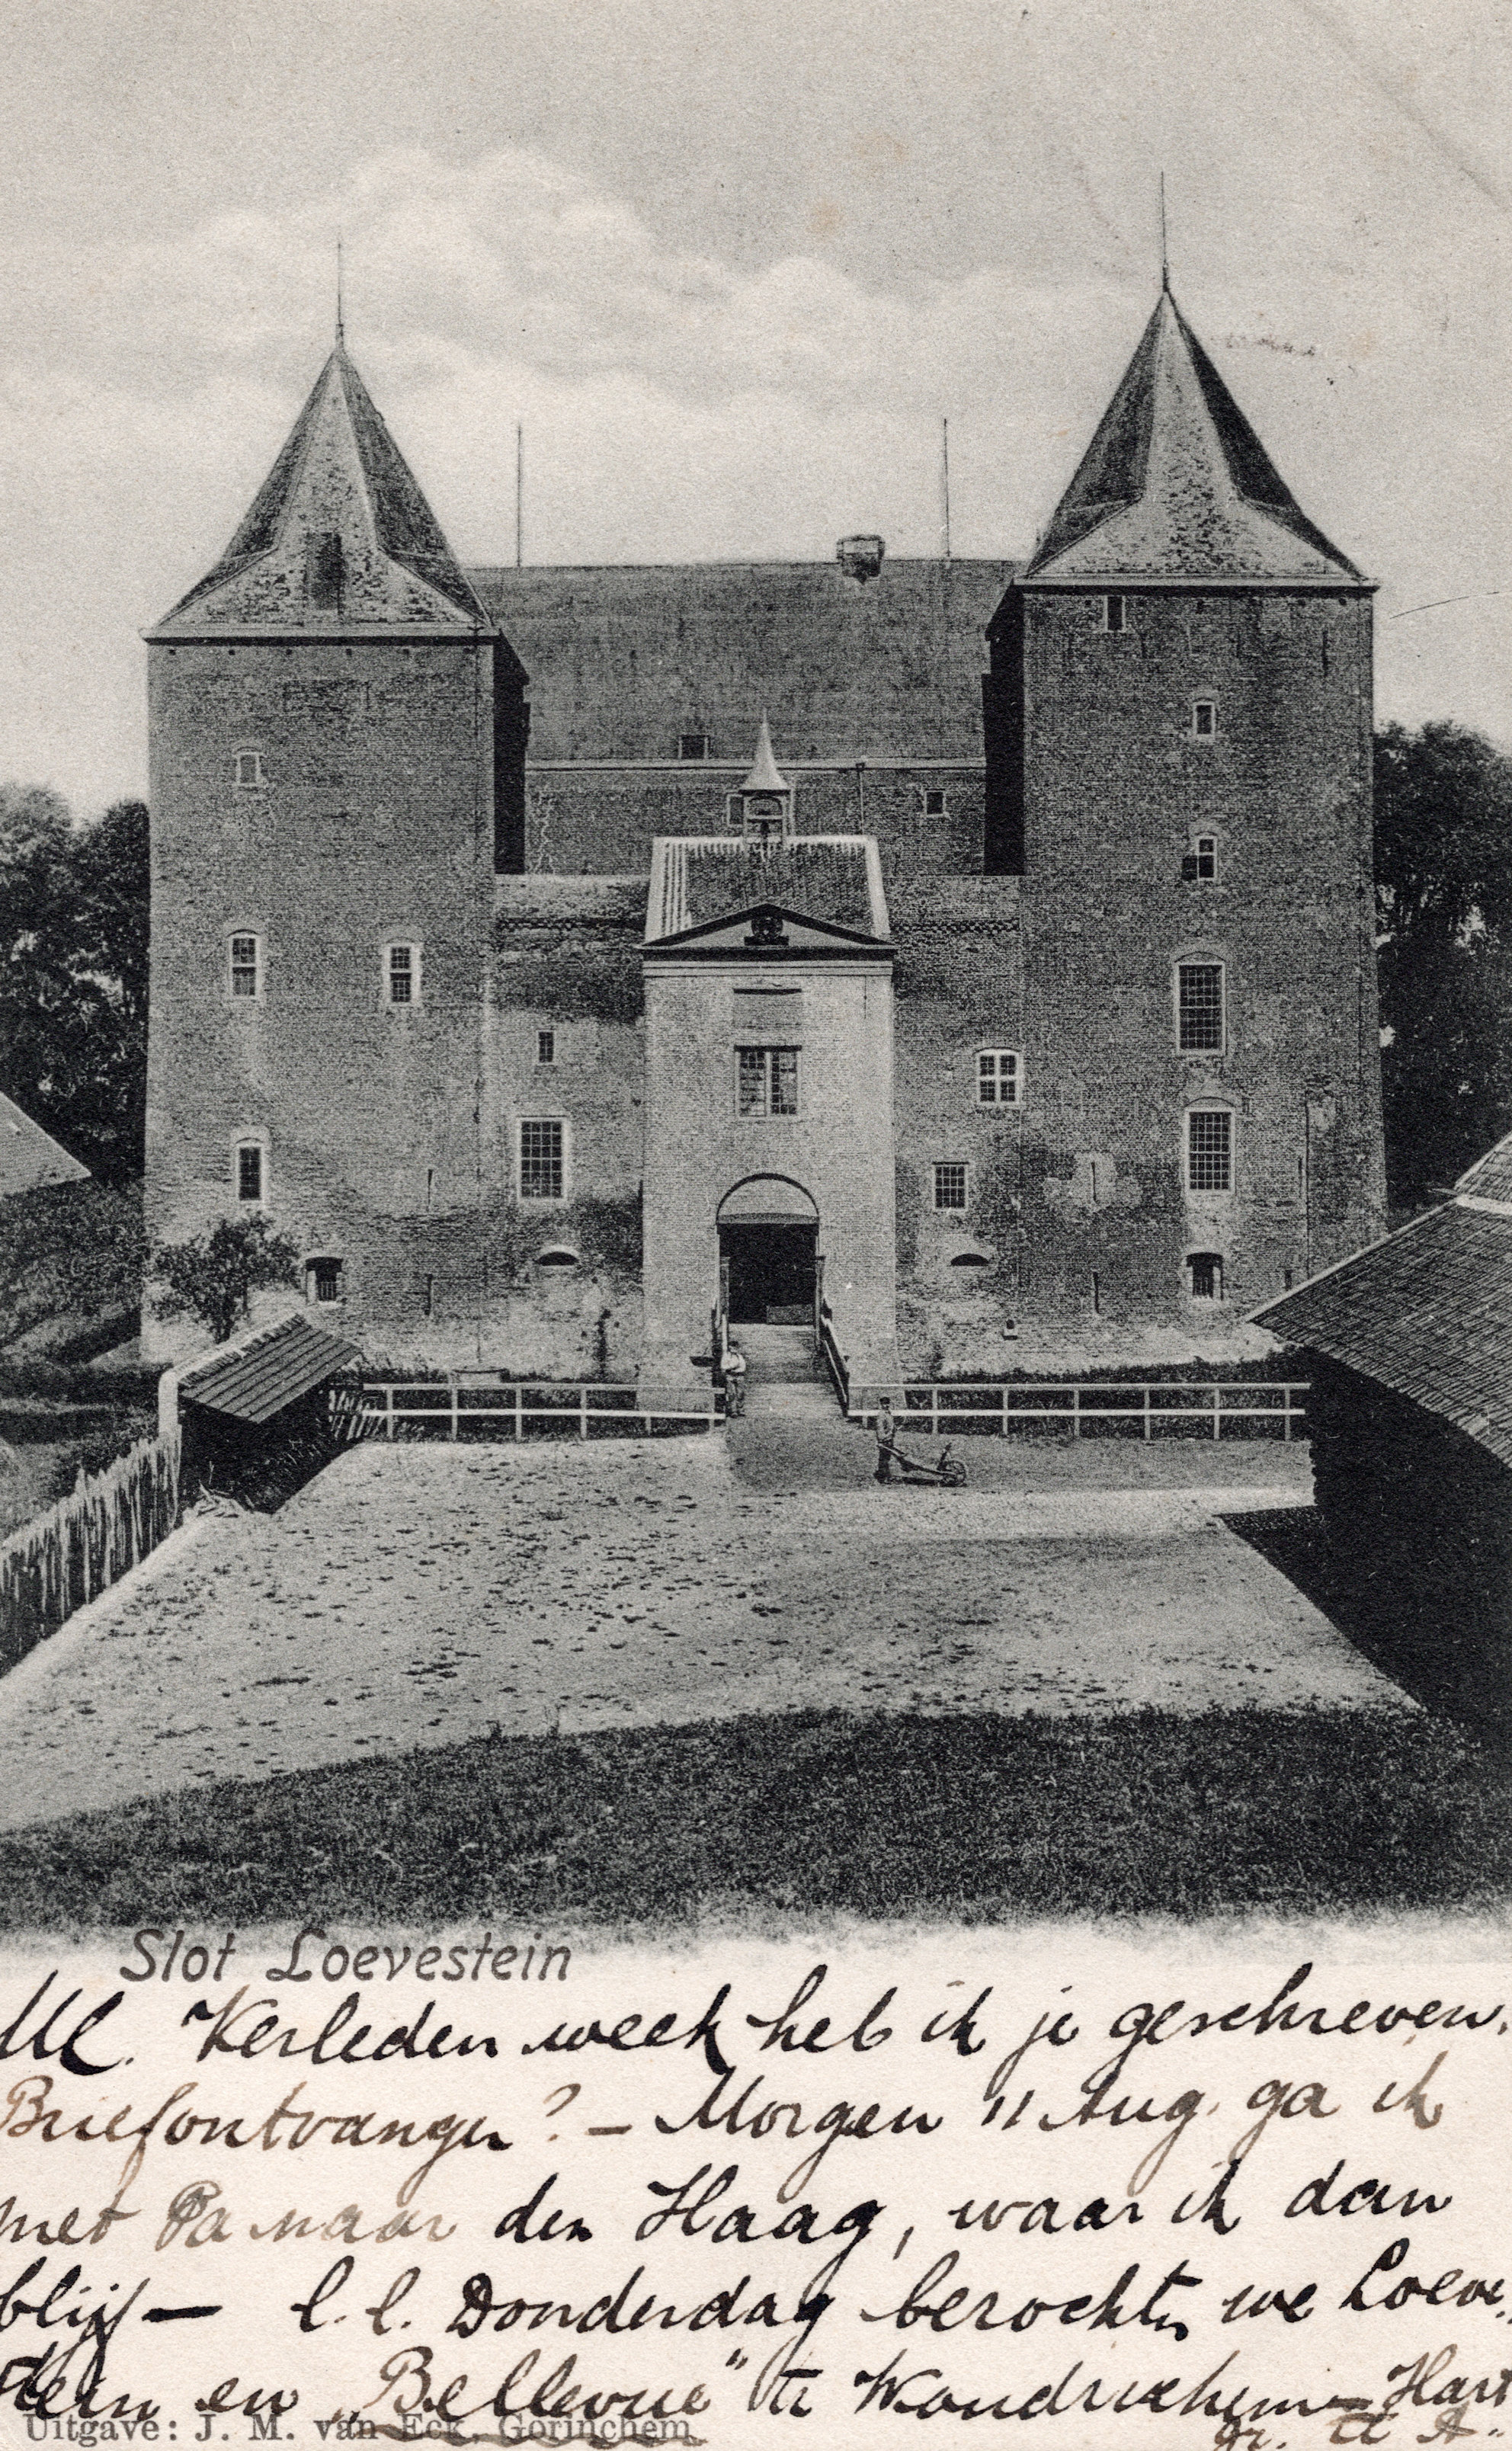 A6-Slot-Loevestein-1907